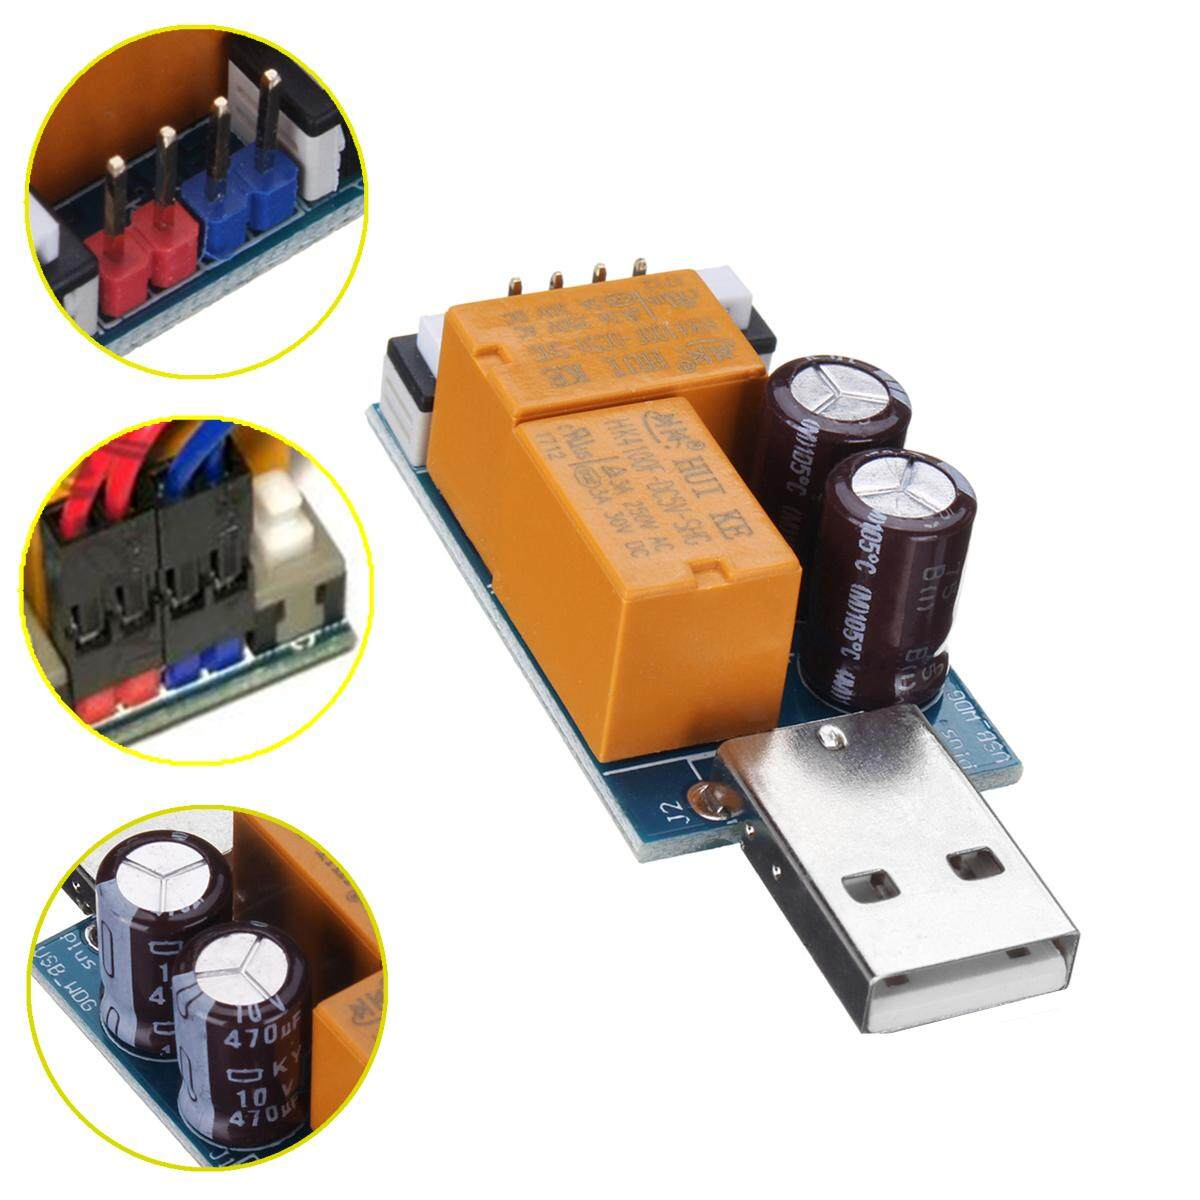 USB Watchdog Kartu Komputer Restart Biru Layar Mining Server Permainan BTC Miner-Internasional